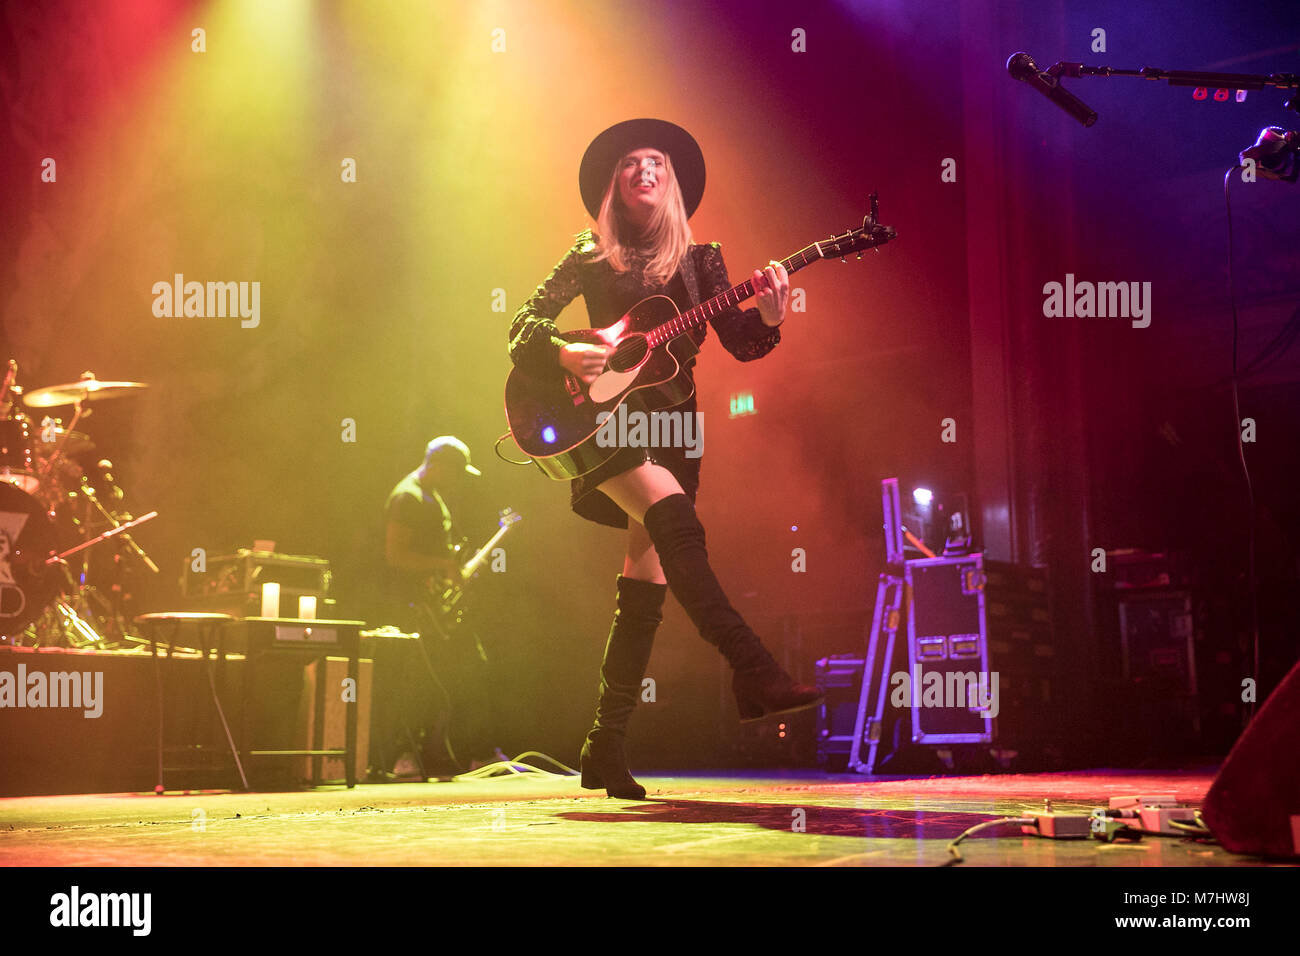 San Francisco, USA. 07th Mar, 2018. ZZ Ward performs on March 7, 2018 at the Regency Ballroom in San Francisco, - Stock Image